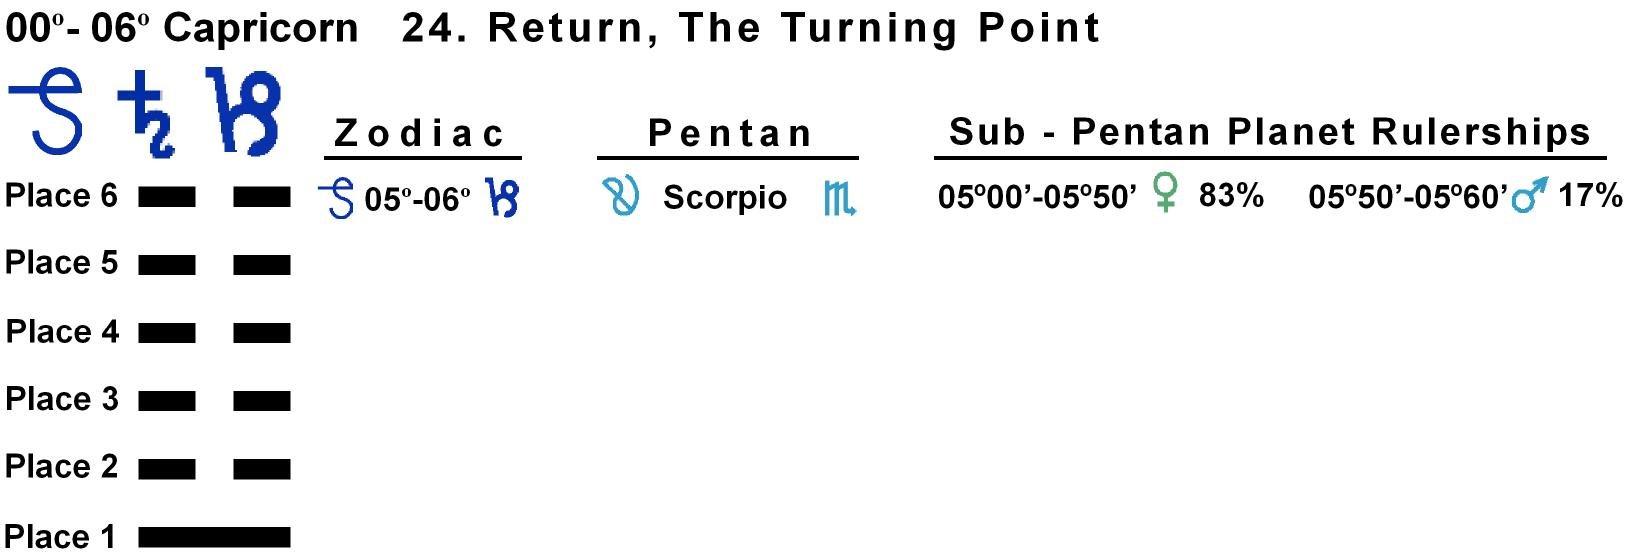 Pent-lines-10CP 05-06 Hx-24 Return